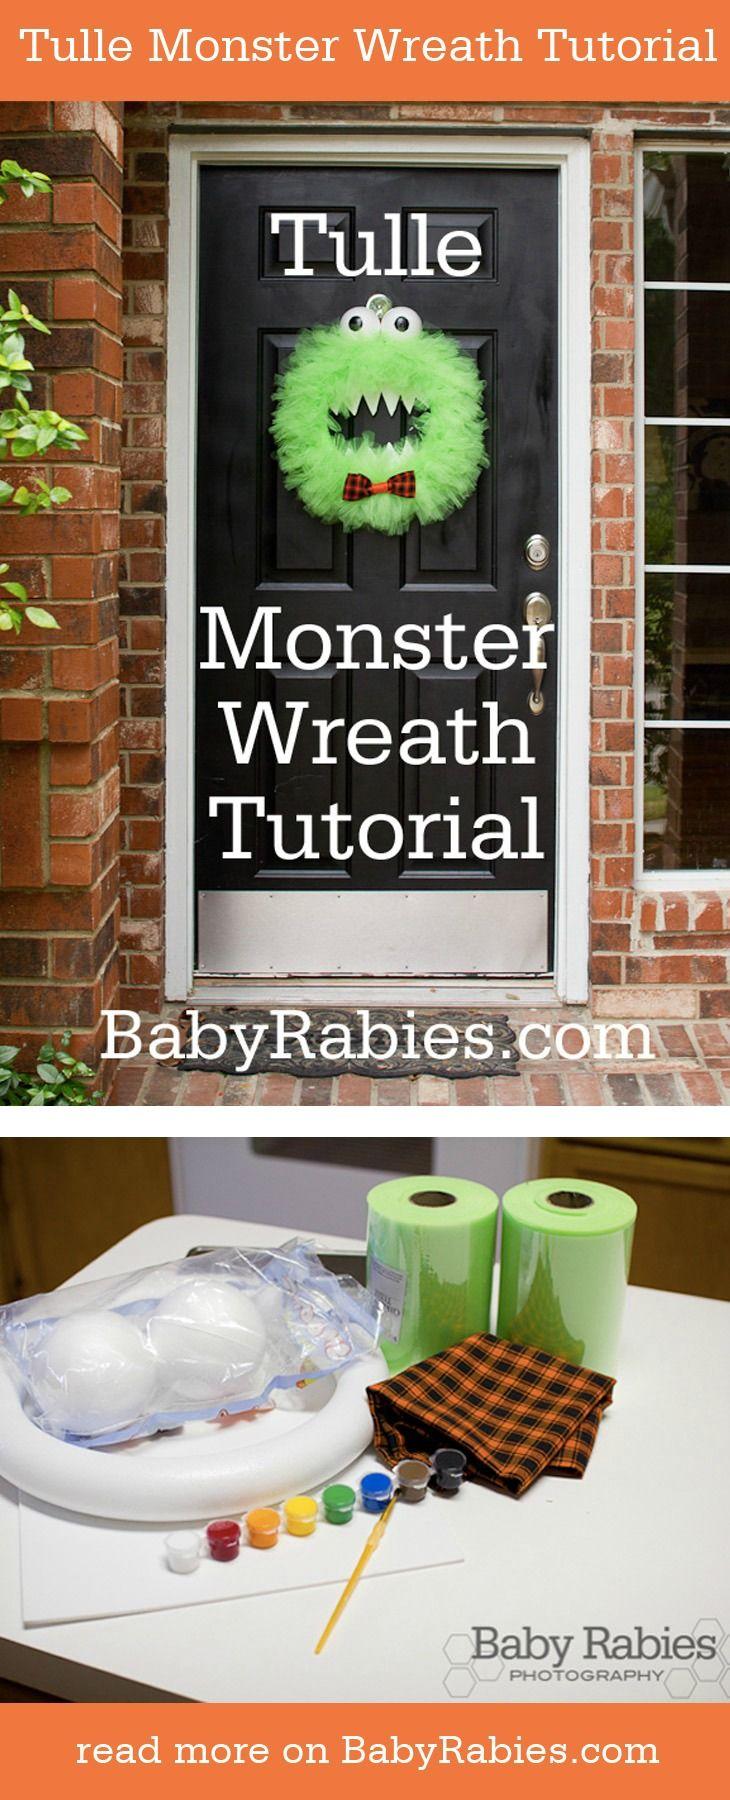 DIY Tulle Monster Wreath Tutorial via BabyRabies.com #halloween #diy #crafty #wreath